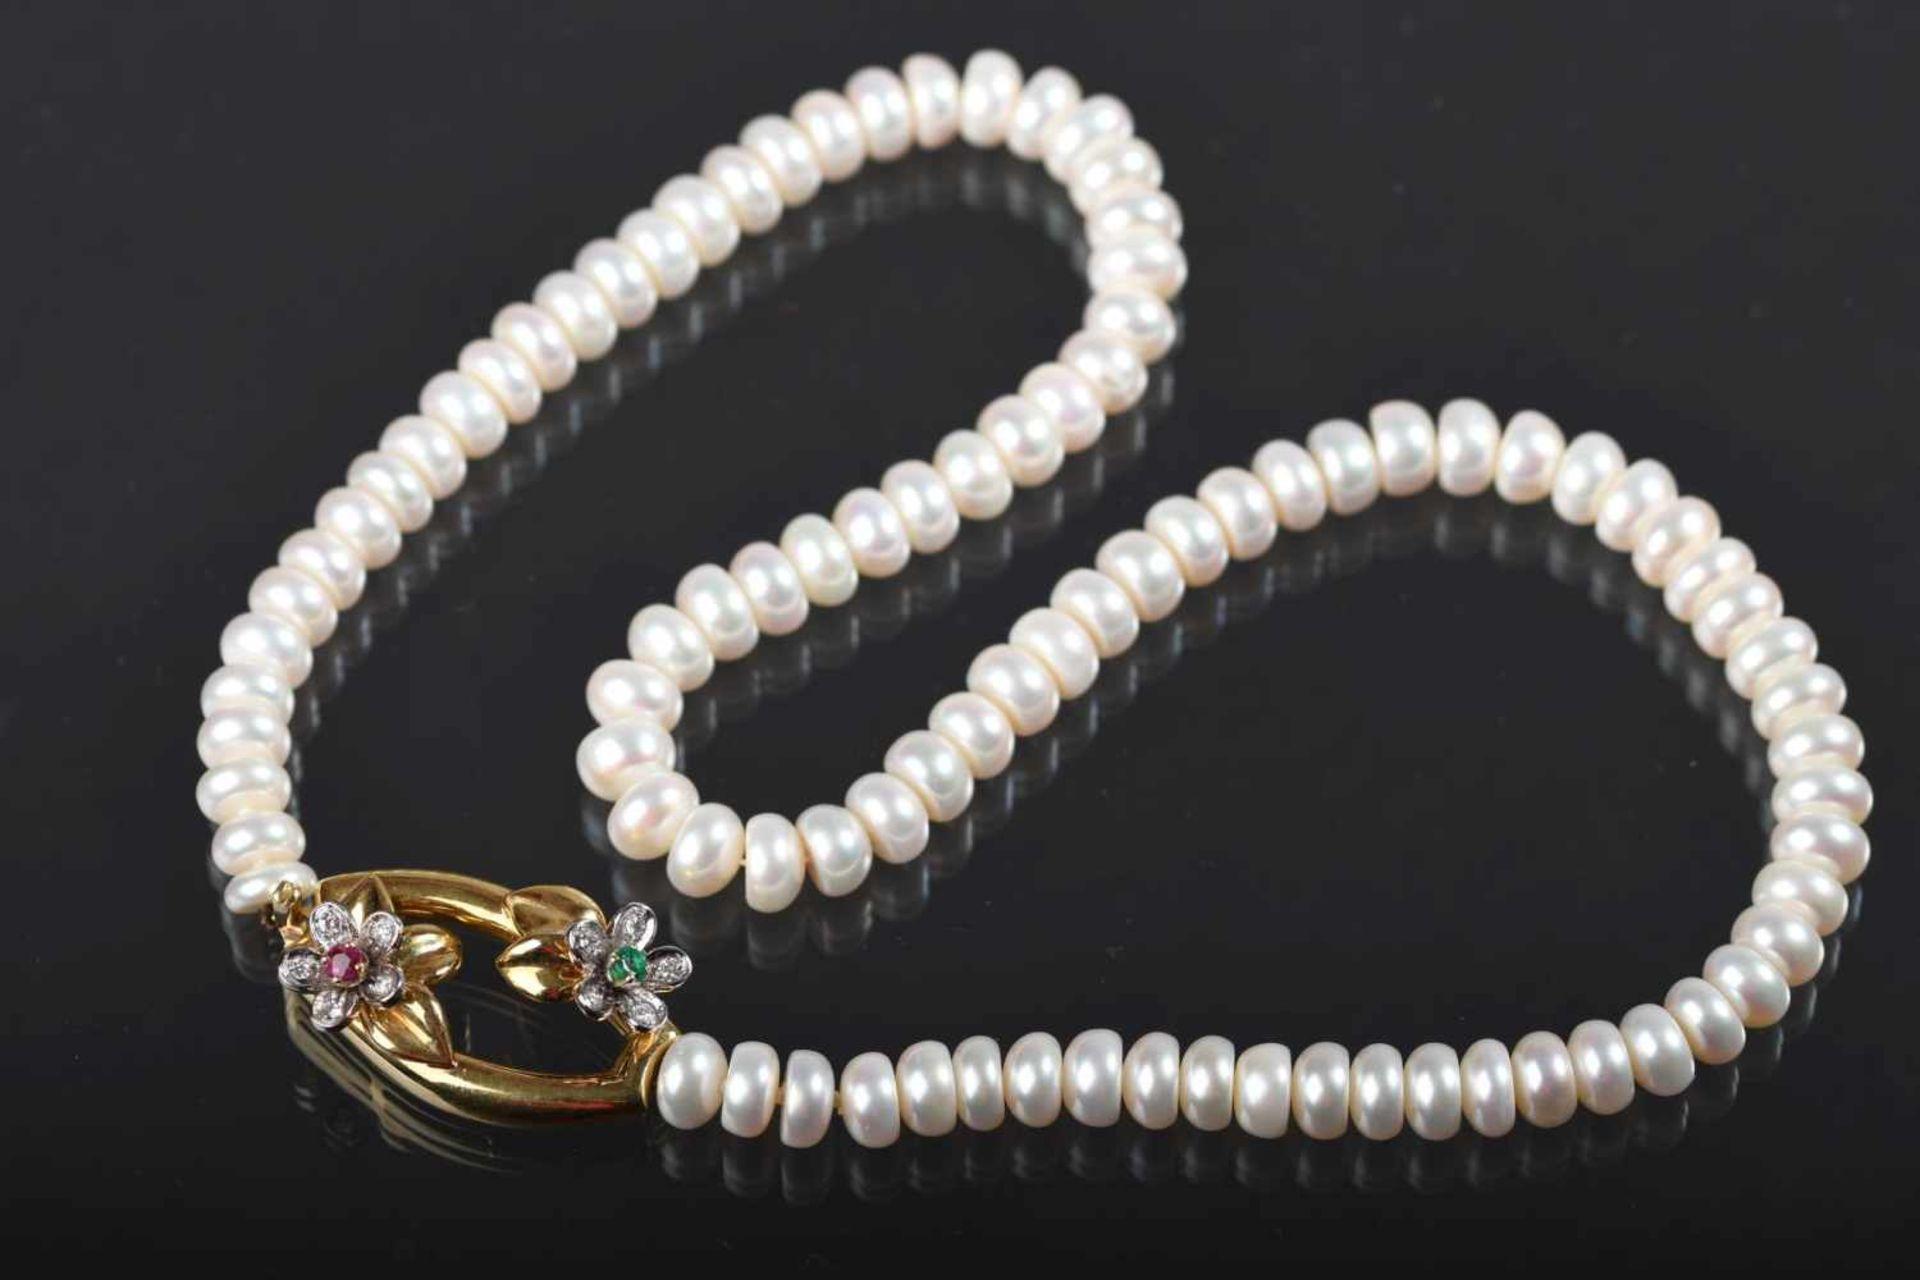 Zuchtperlenkette, Schließe 750aus crèmeweißen, boutonförmigen Perlen, ᴓ ca. 6 mm, massive Schließe